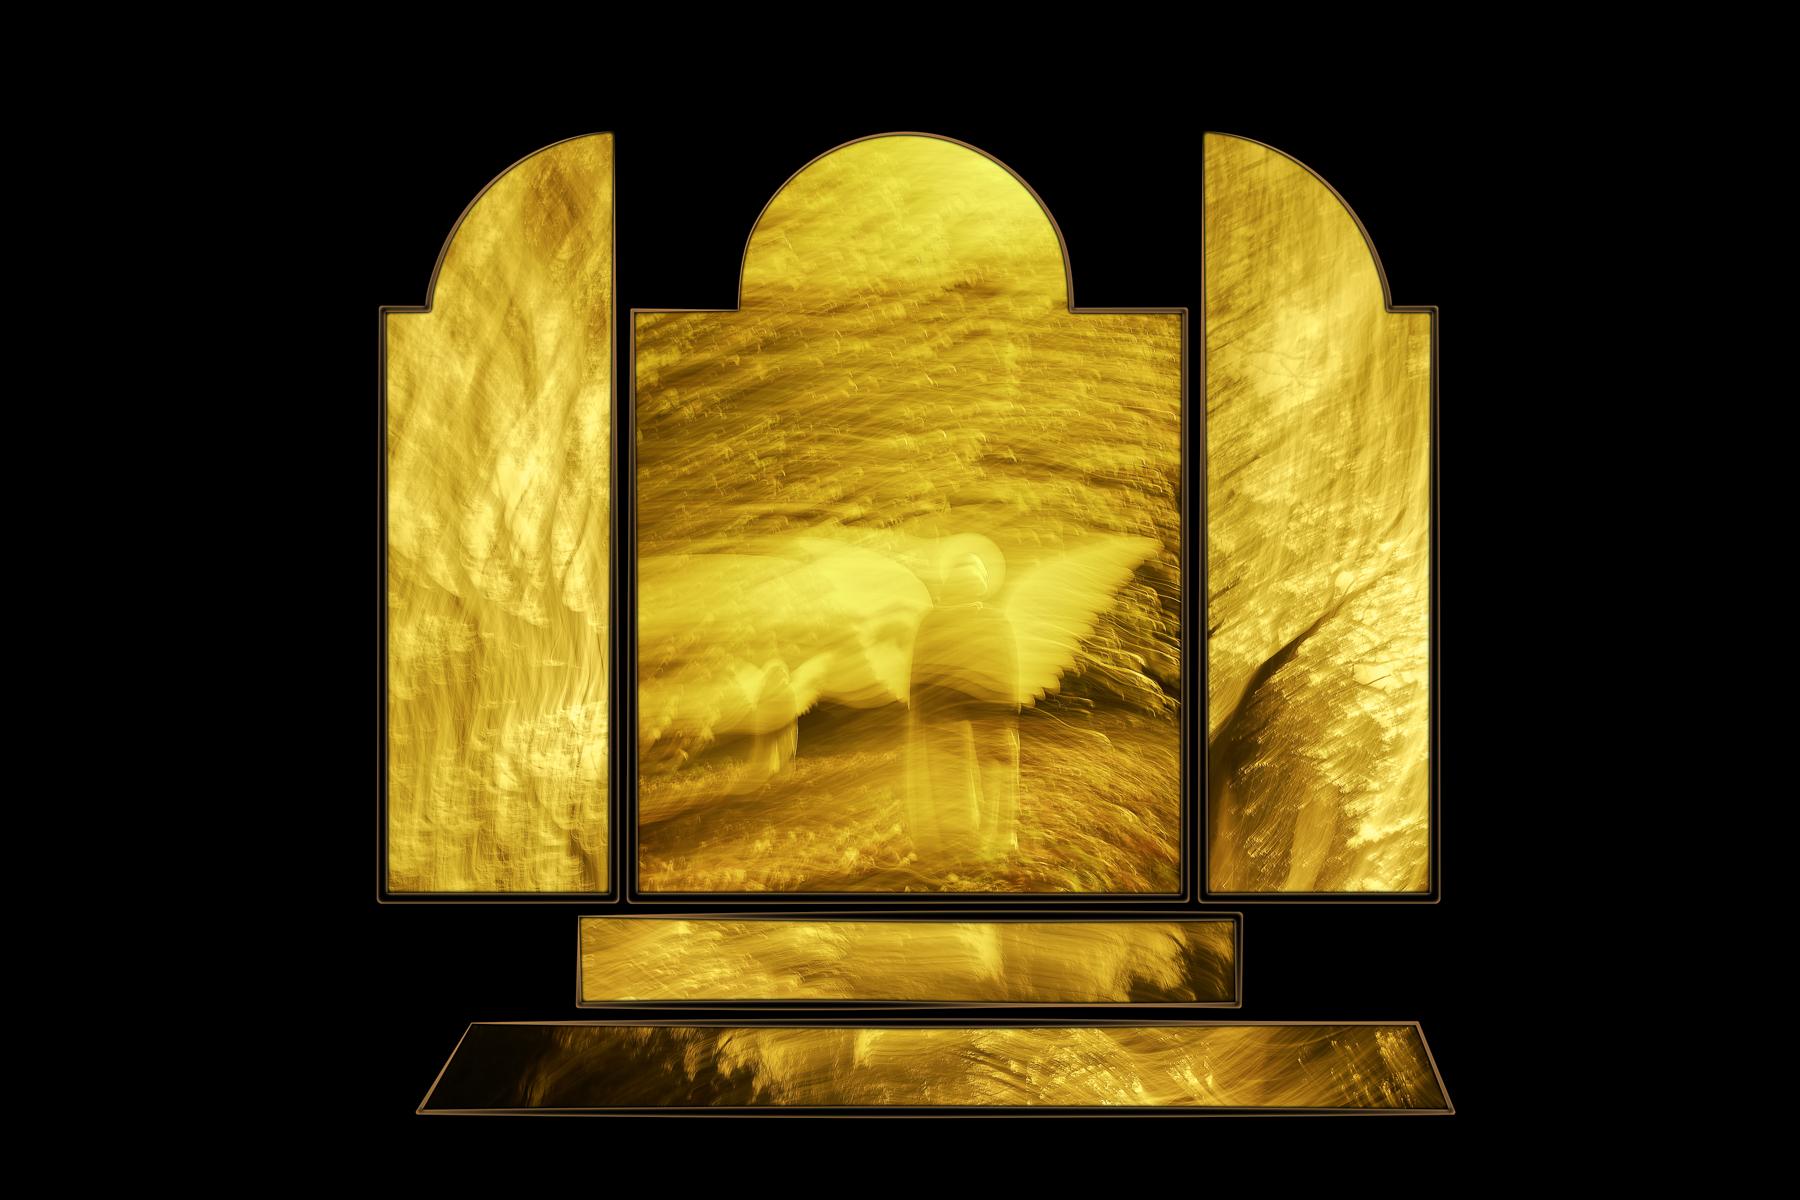 Danie_Munteanu_Polyptych Compositions_Angel Wings_4.jpg